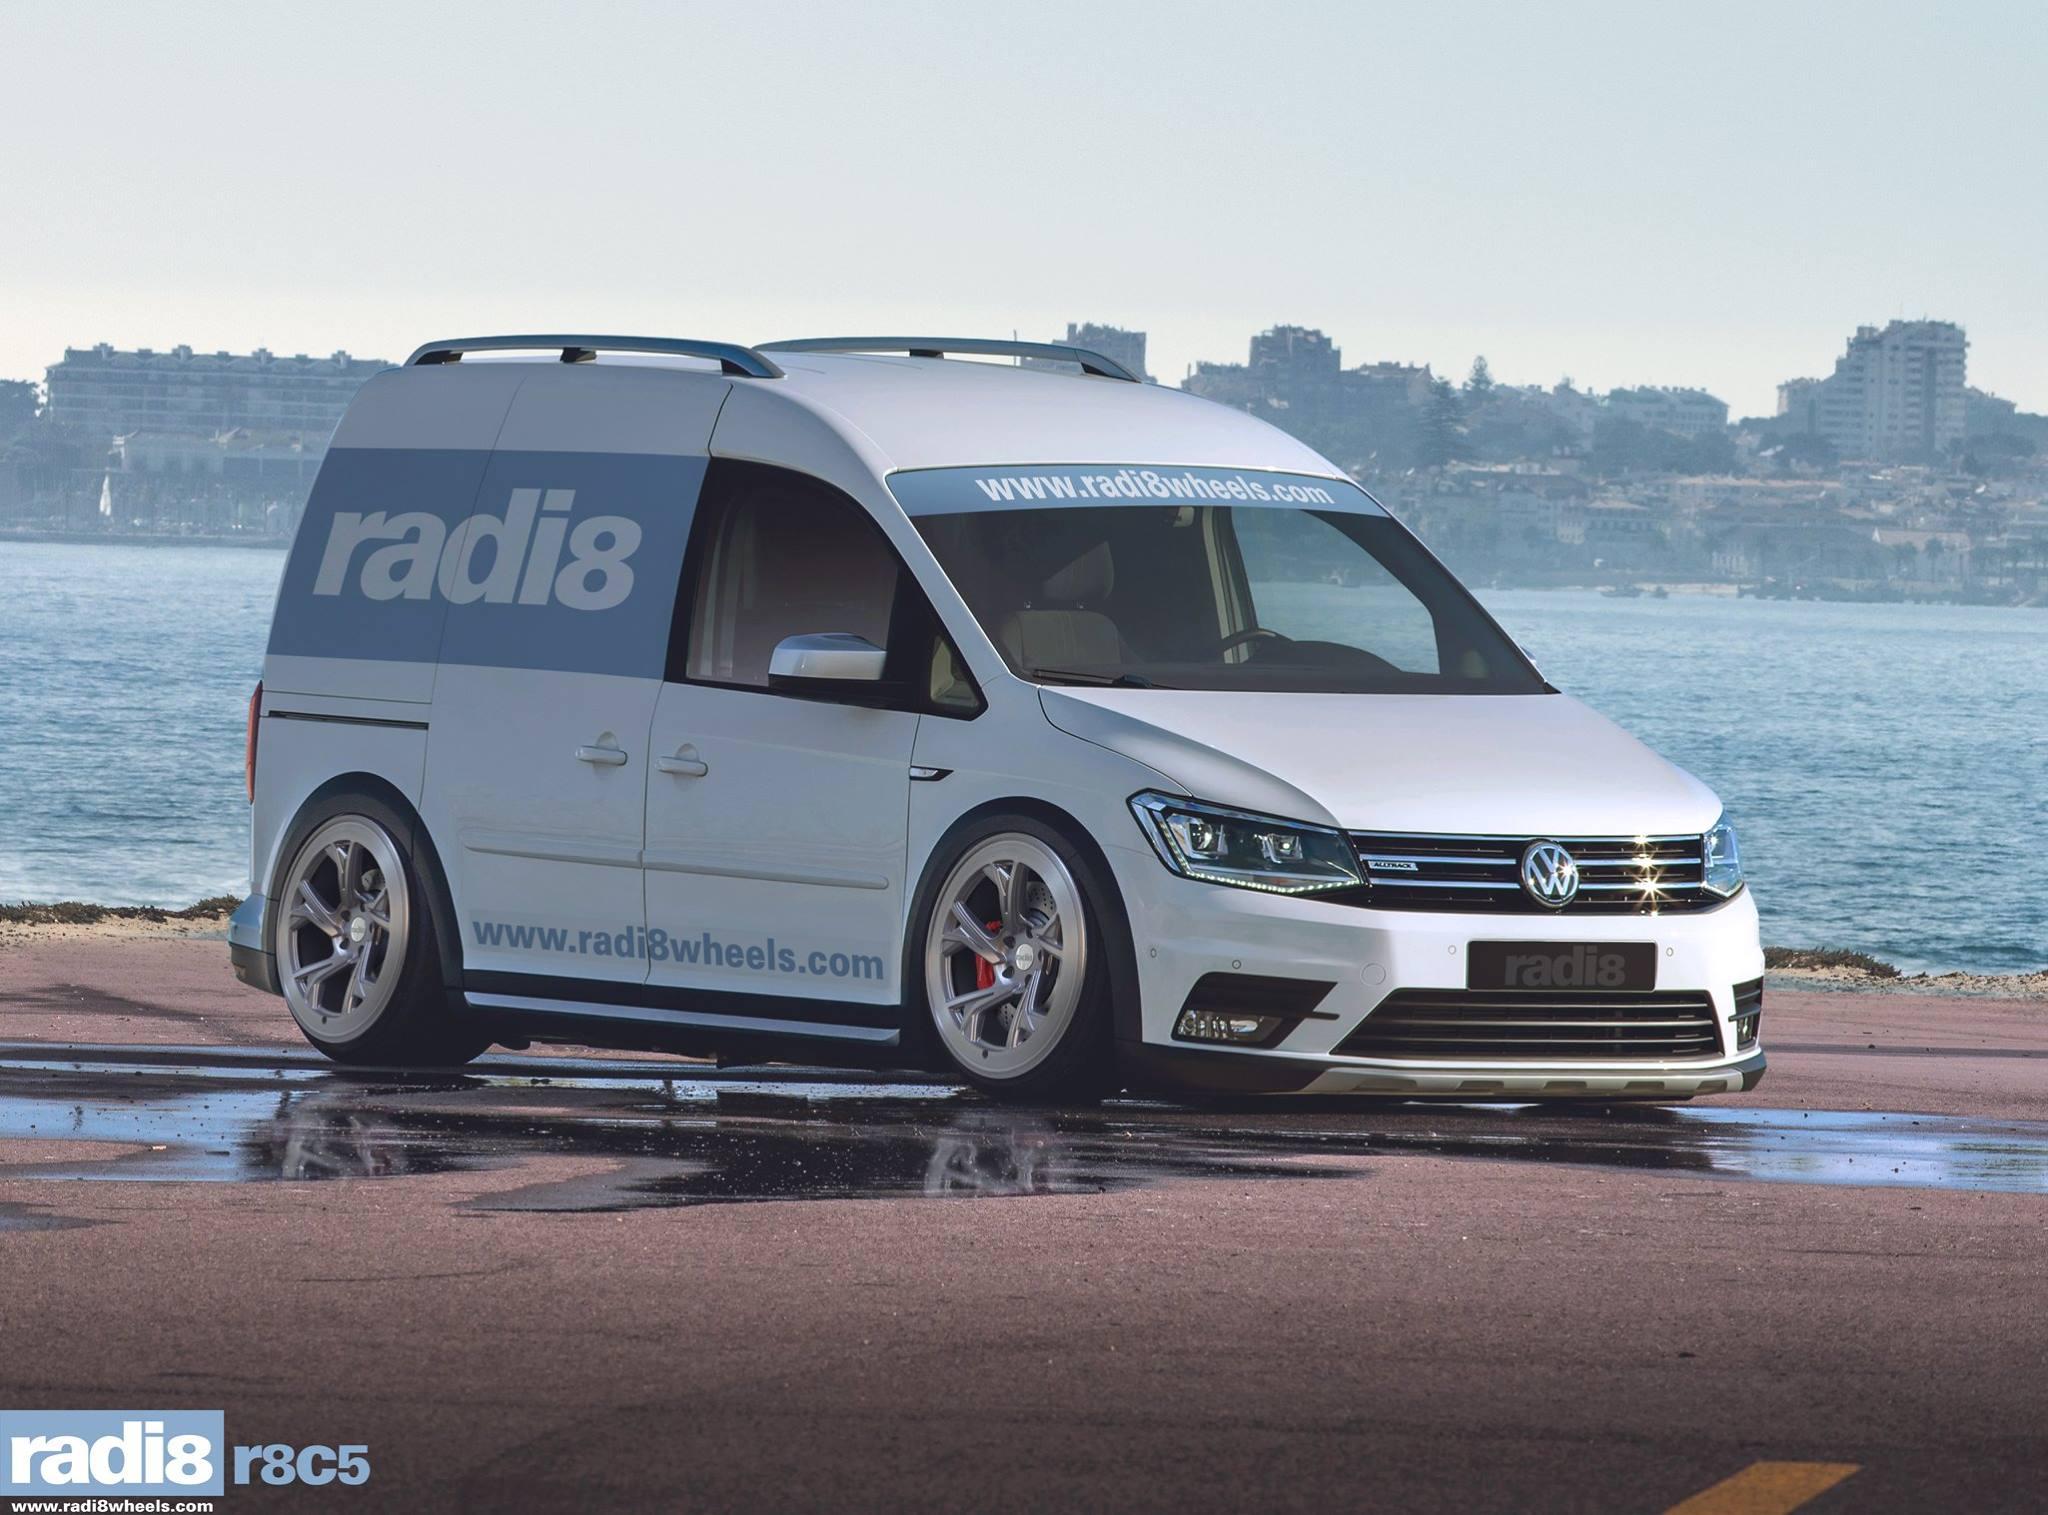 Radi8 R8C5 - Volkswagen Caddy 65